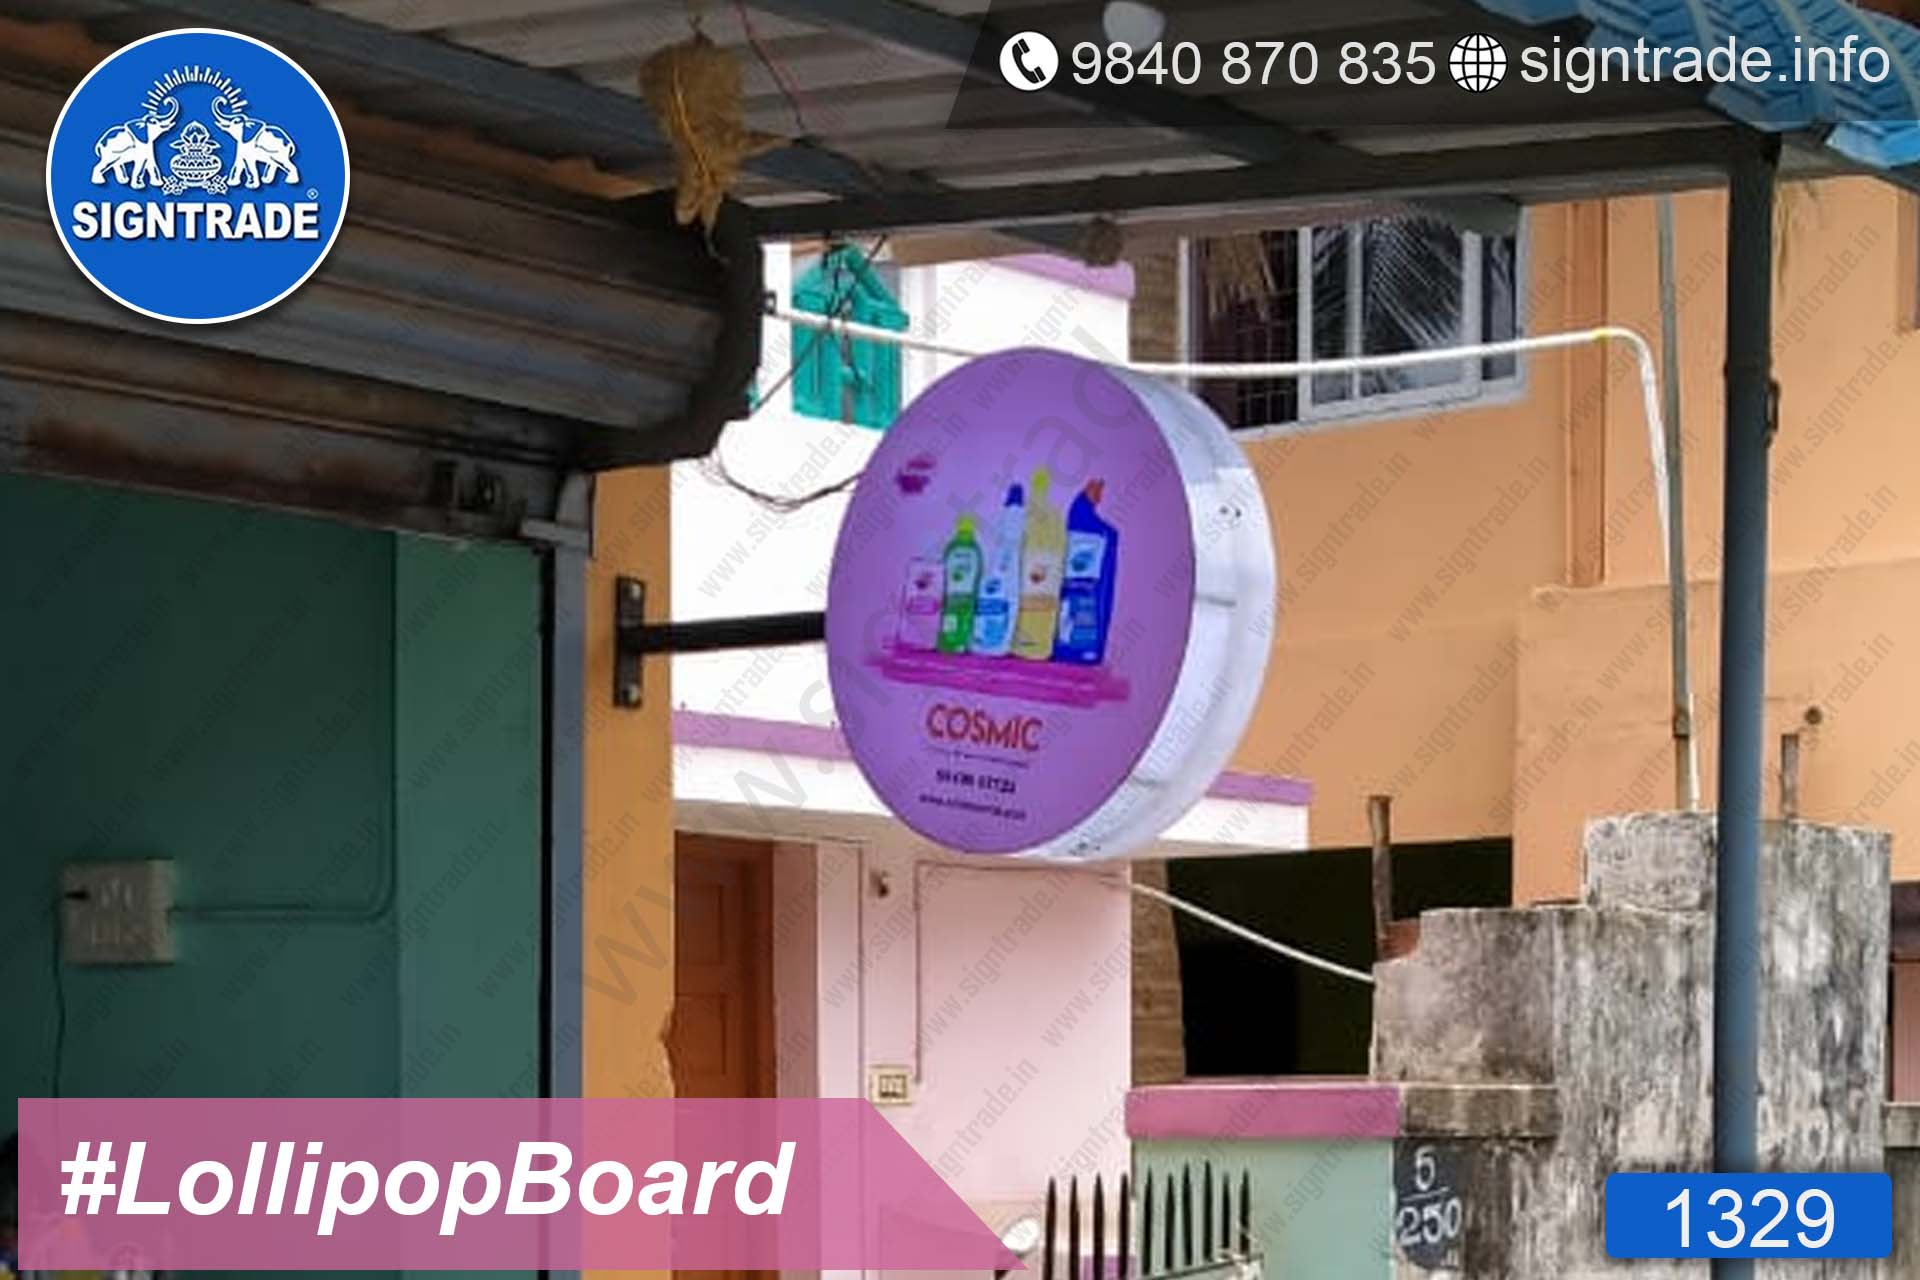 COSMIC - Kovilambakkam - Chennai - SIGNTRADE - Lollipop Board, Flange Board Manufacturers in Chennai